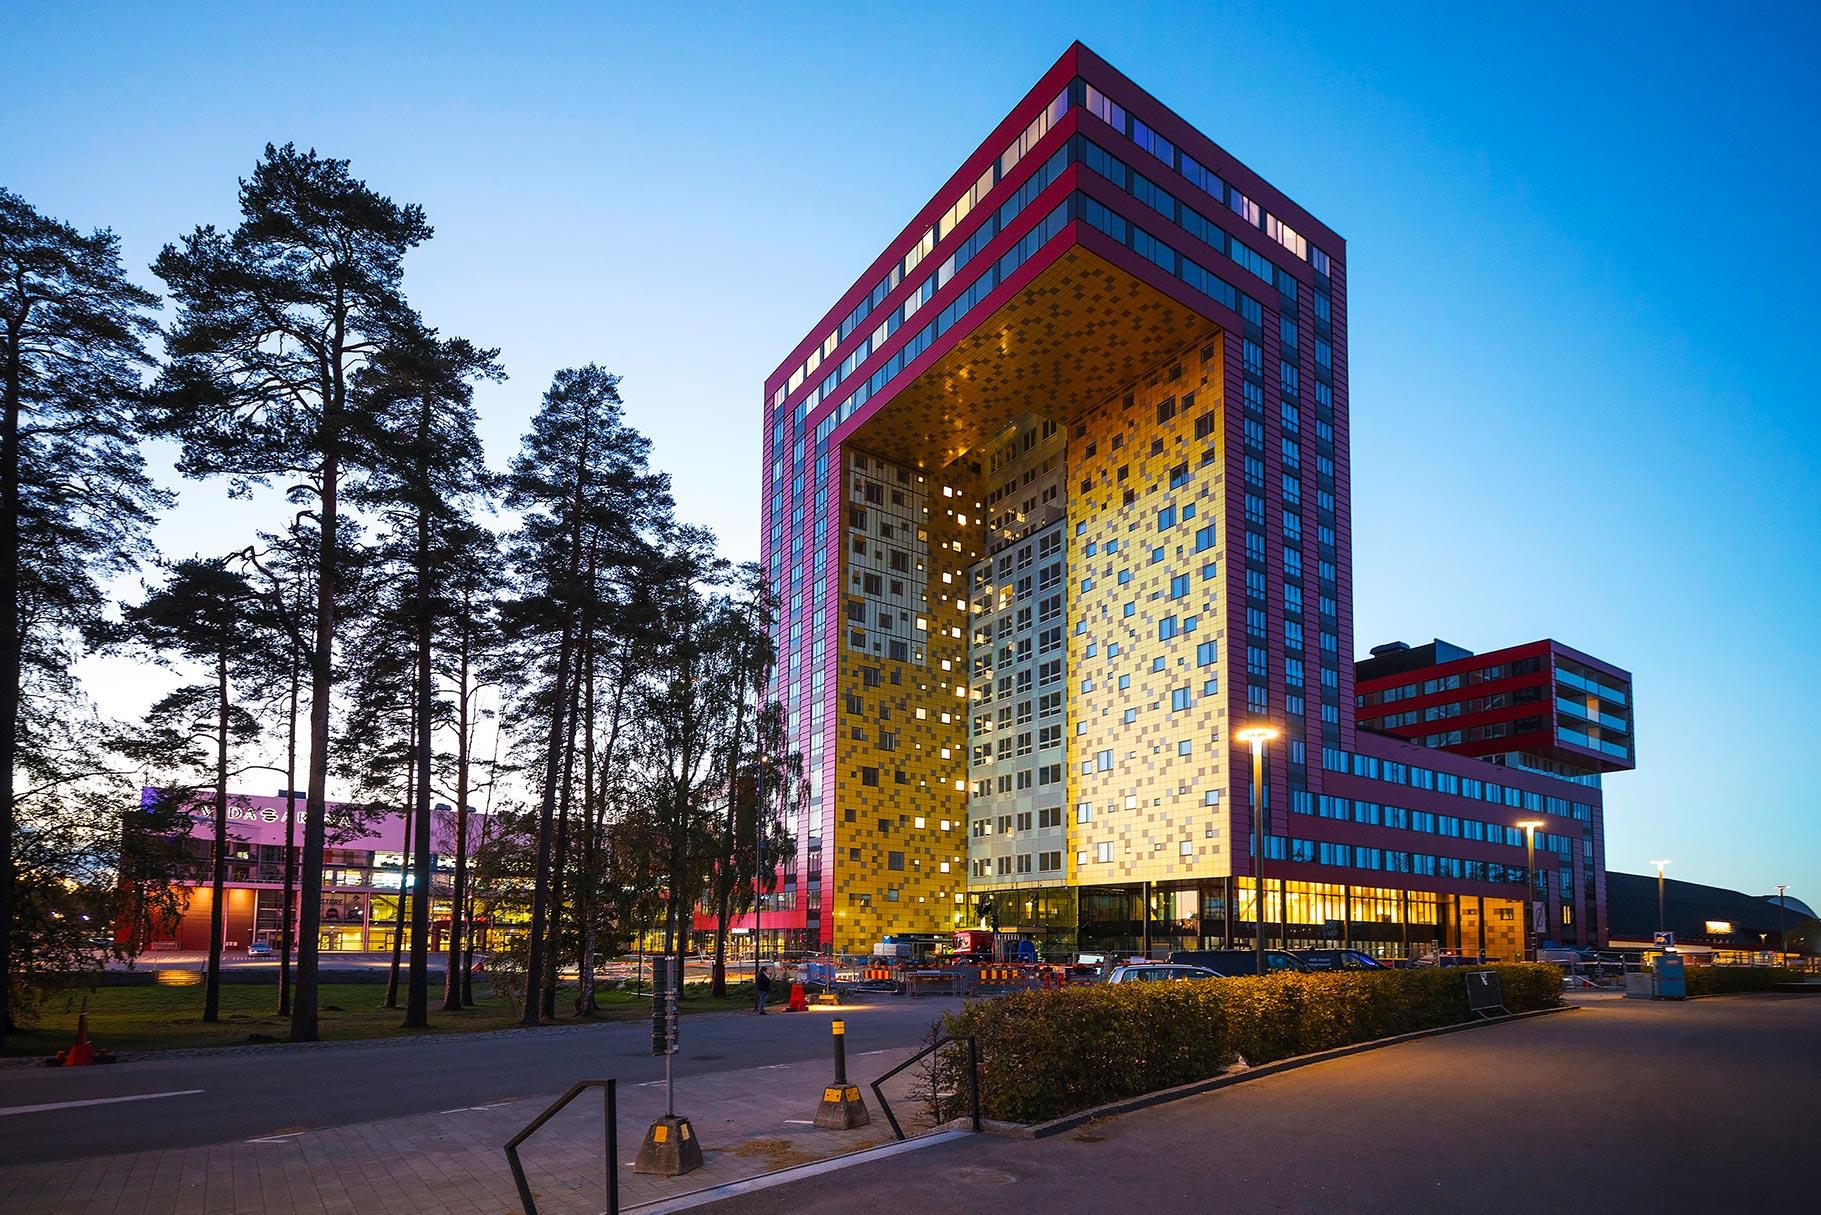 Bishop Media webbyrå öppnar kontor i ICON-huset i Växjö